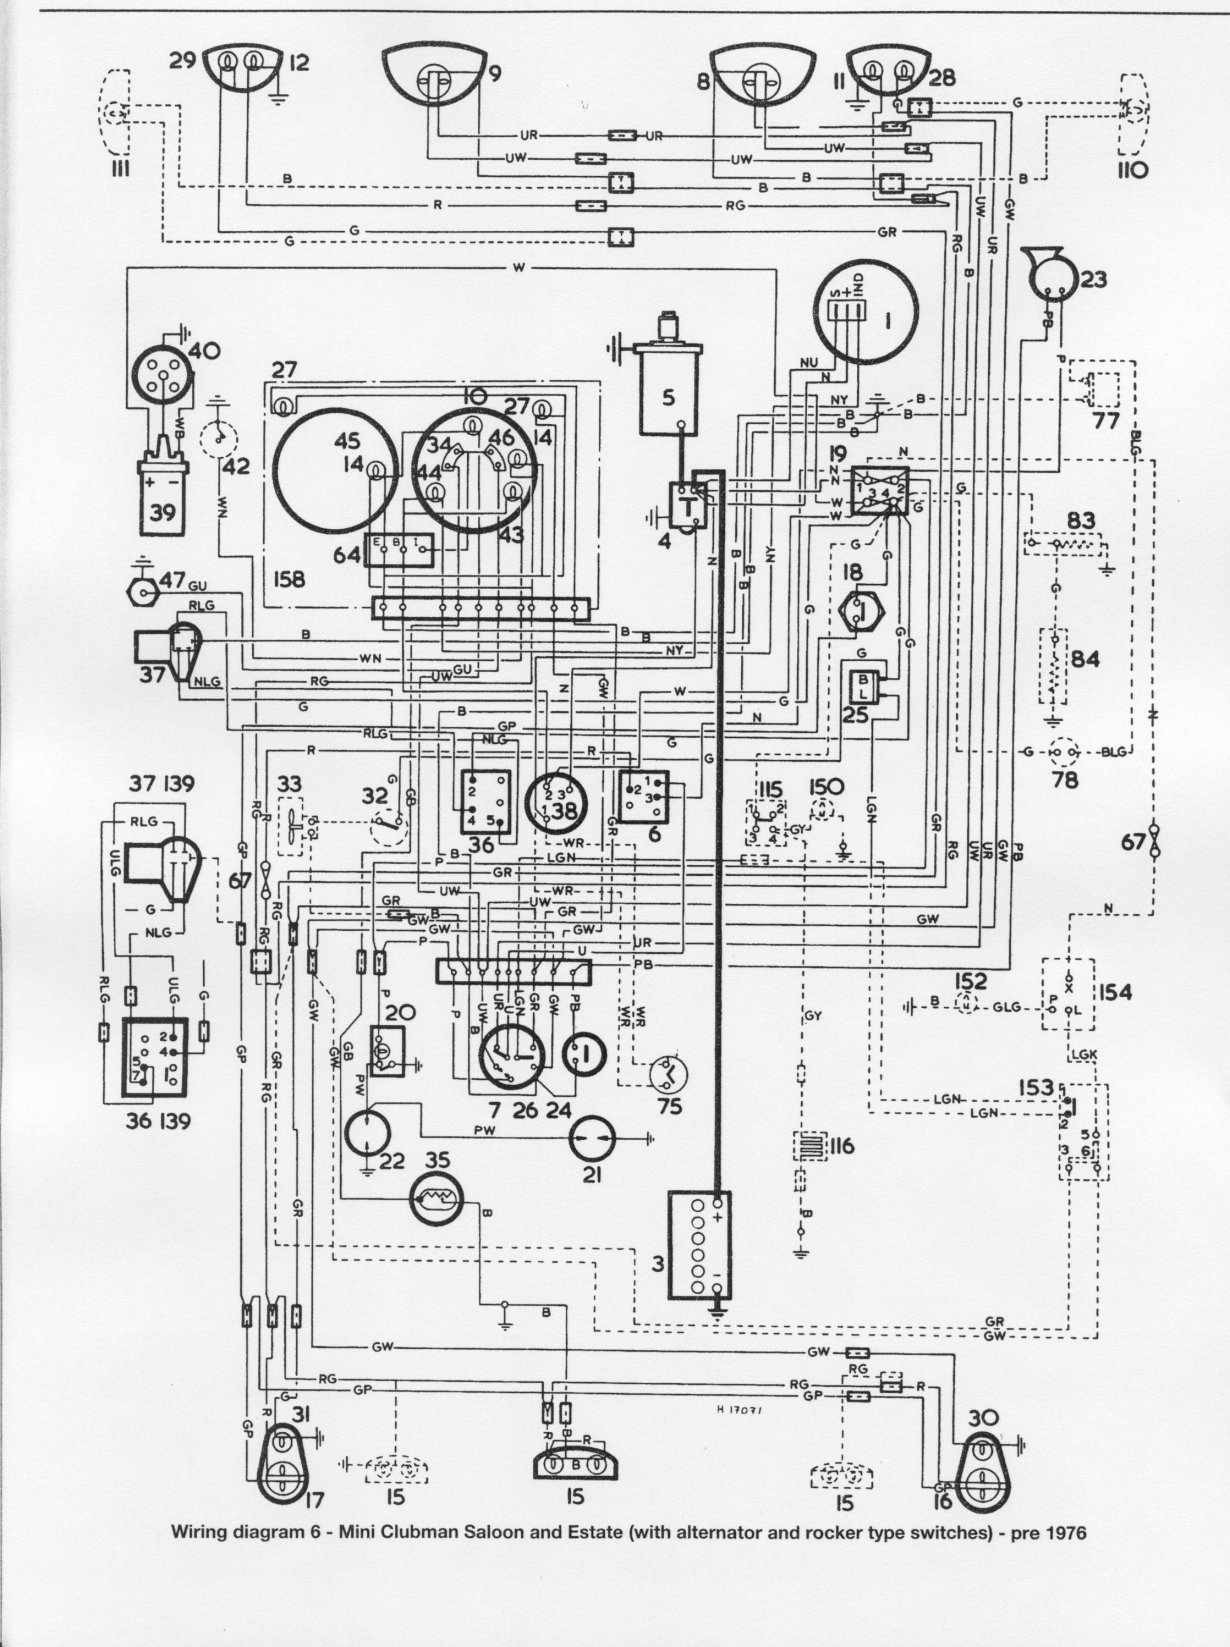 Cooper Light Switch Wiring Diagram - Circuit Diagram Images